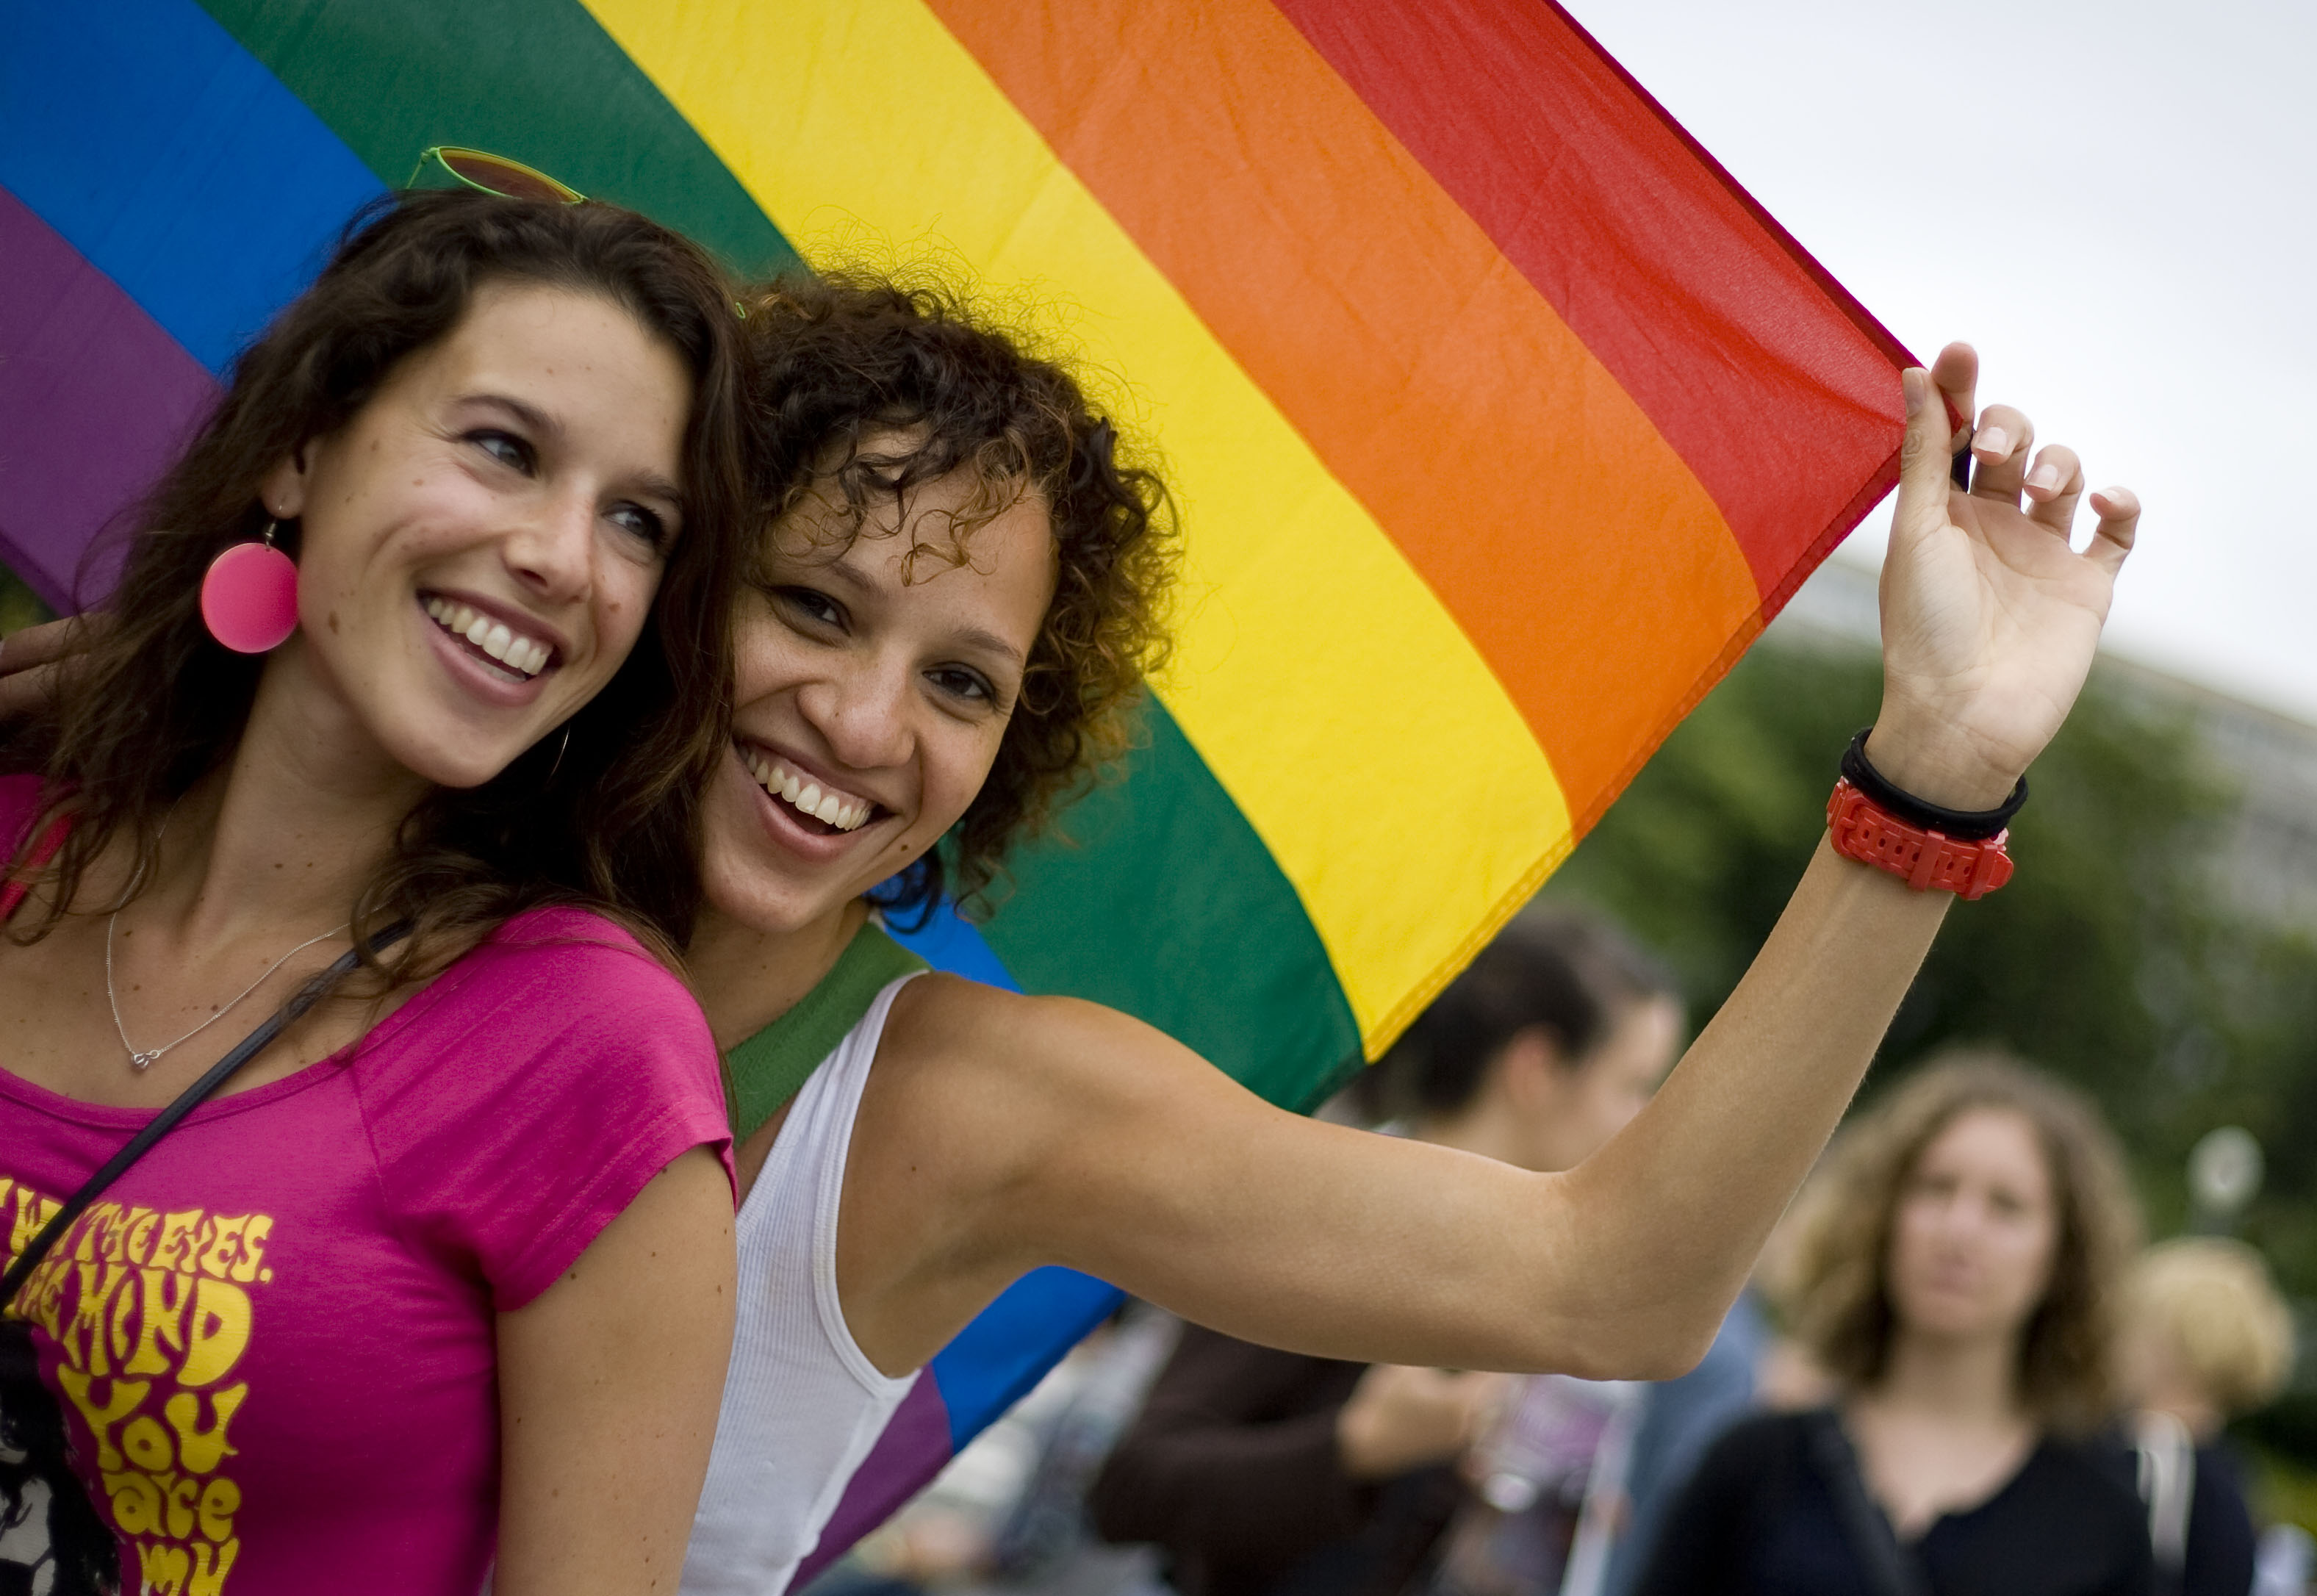 Slovak Republic same-sex couple